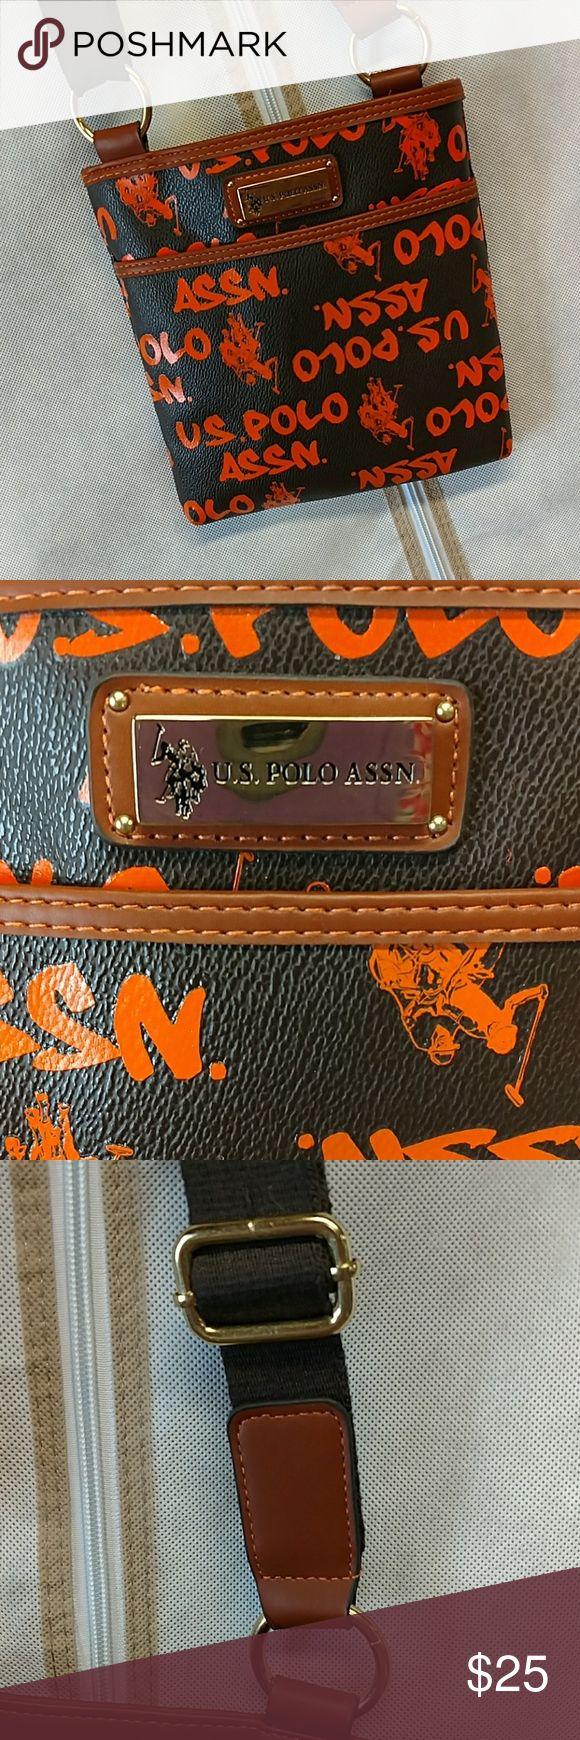 US Polo Assn cross-body bag NWOT NWOT U.S. Polo Assn. Bags